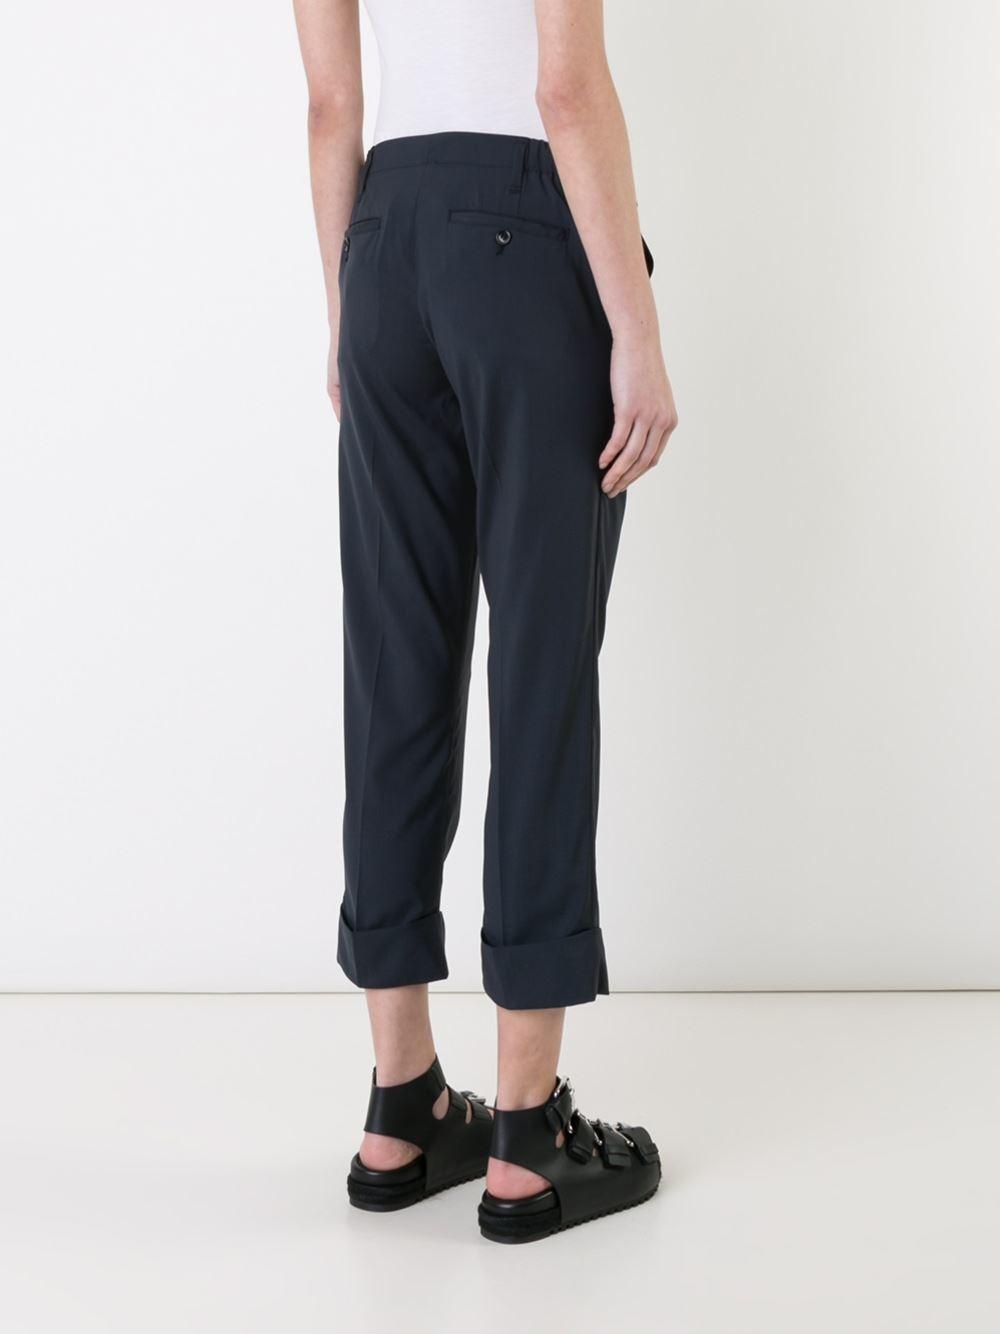 Luxury Julien David Cropped Tailored Pants In Black  Lyst